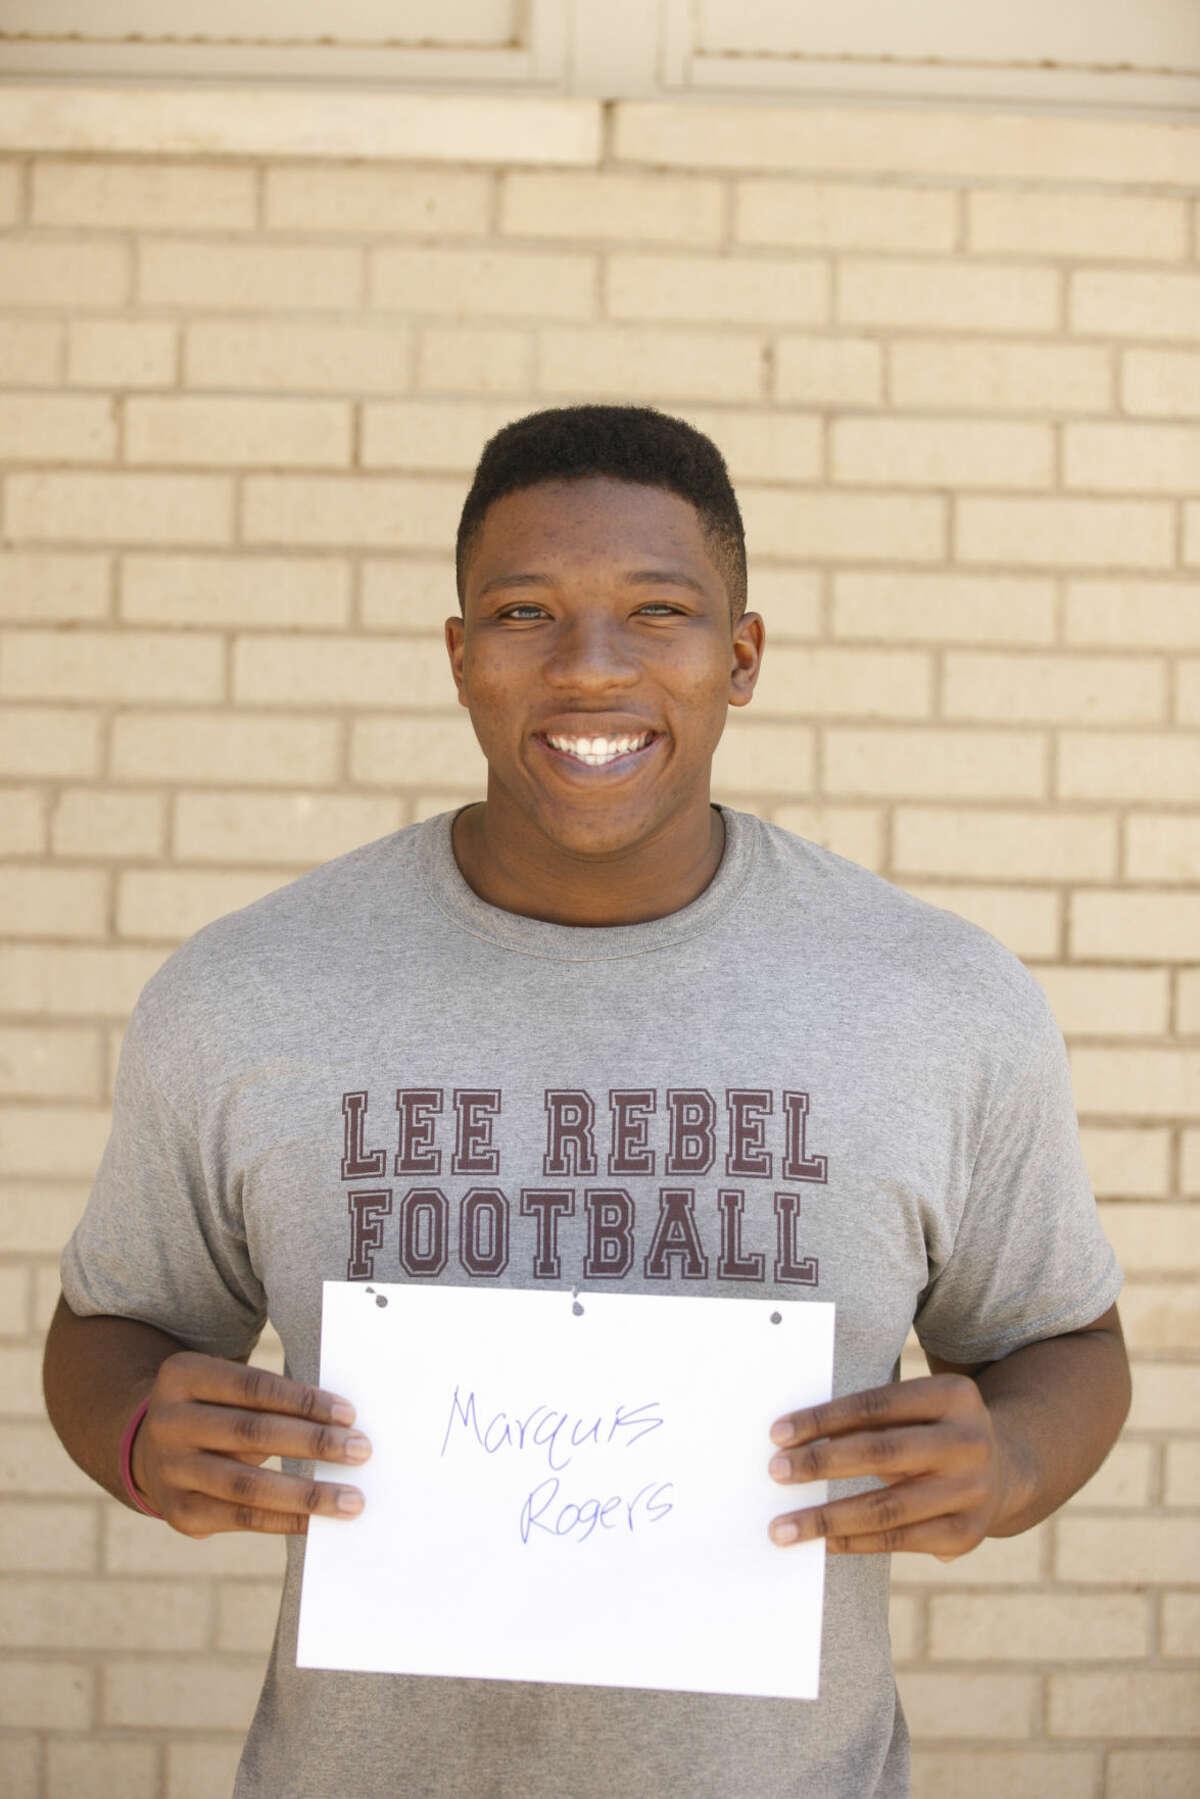 Lee High football mug Marquis Rogers James Durbin/Reporter-Telegram